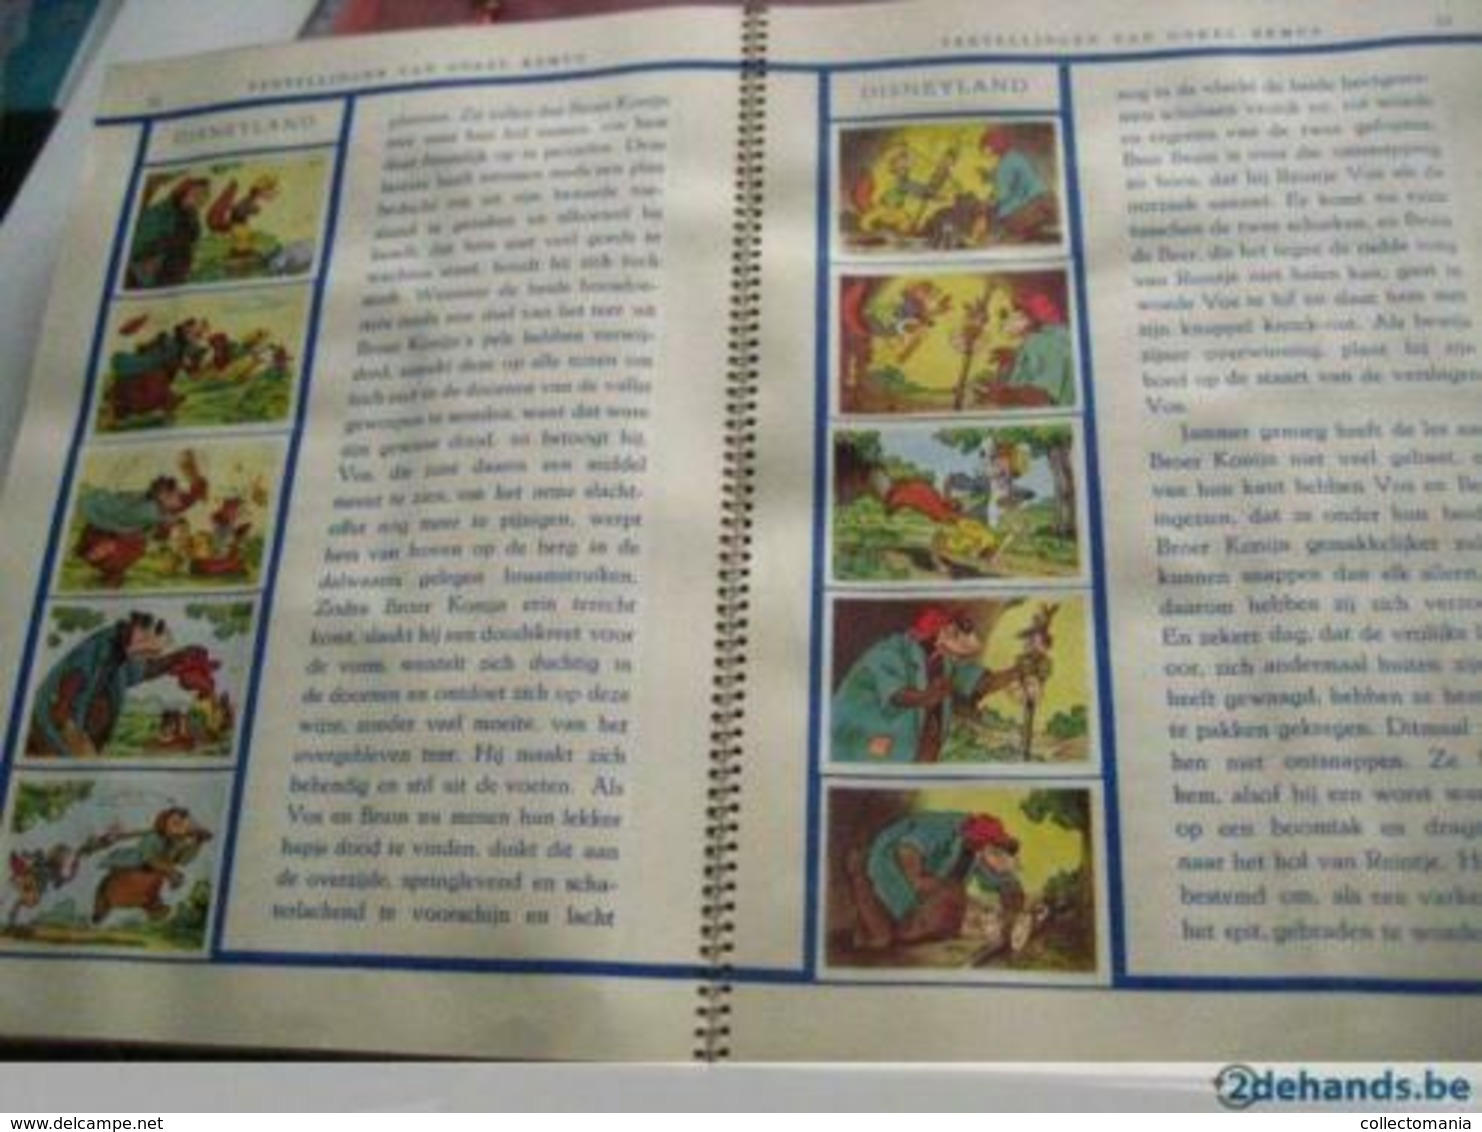 1 Full Compl Set 133 Small & 10 Big, 5 Stories Disneyland, De Beukelaer, Peter &  Wolf, Donkey,album C1950 SPLENDID - Chocolate